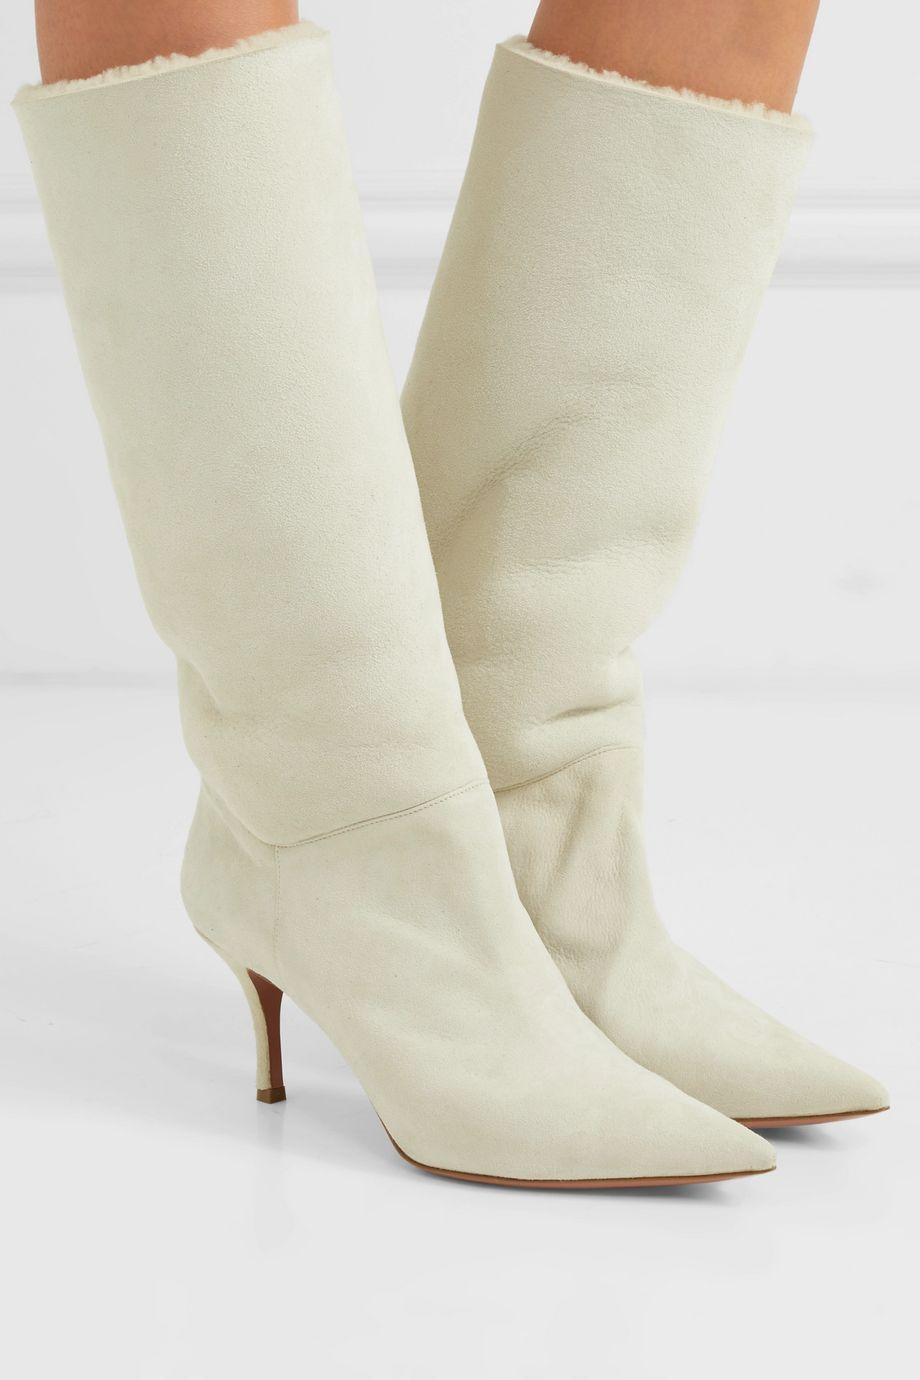 Amina Muaddi Ida shearling-lined suede knee boots